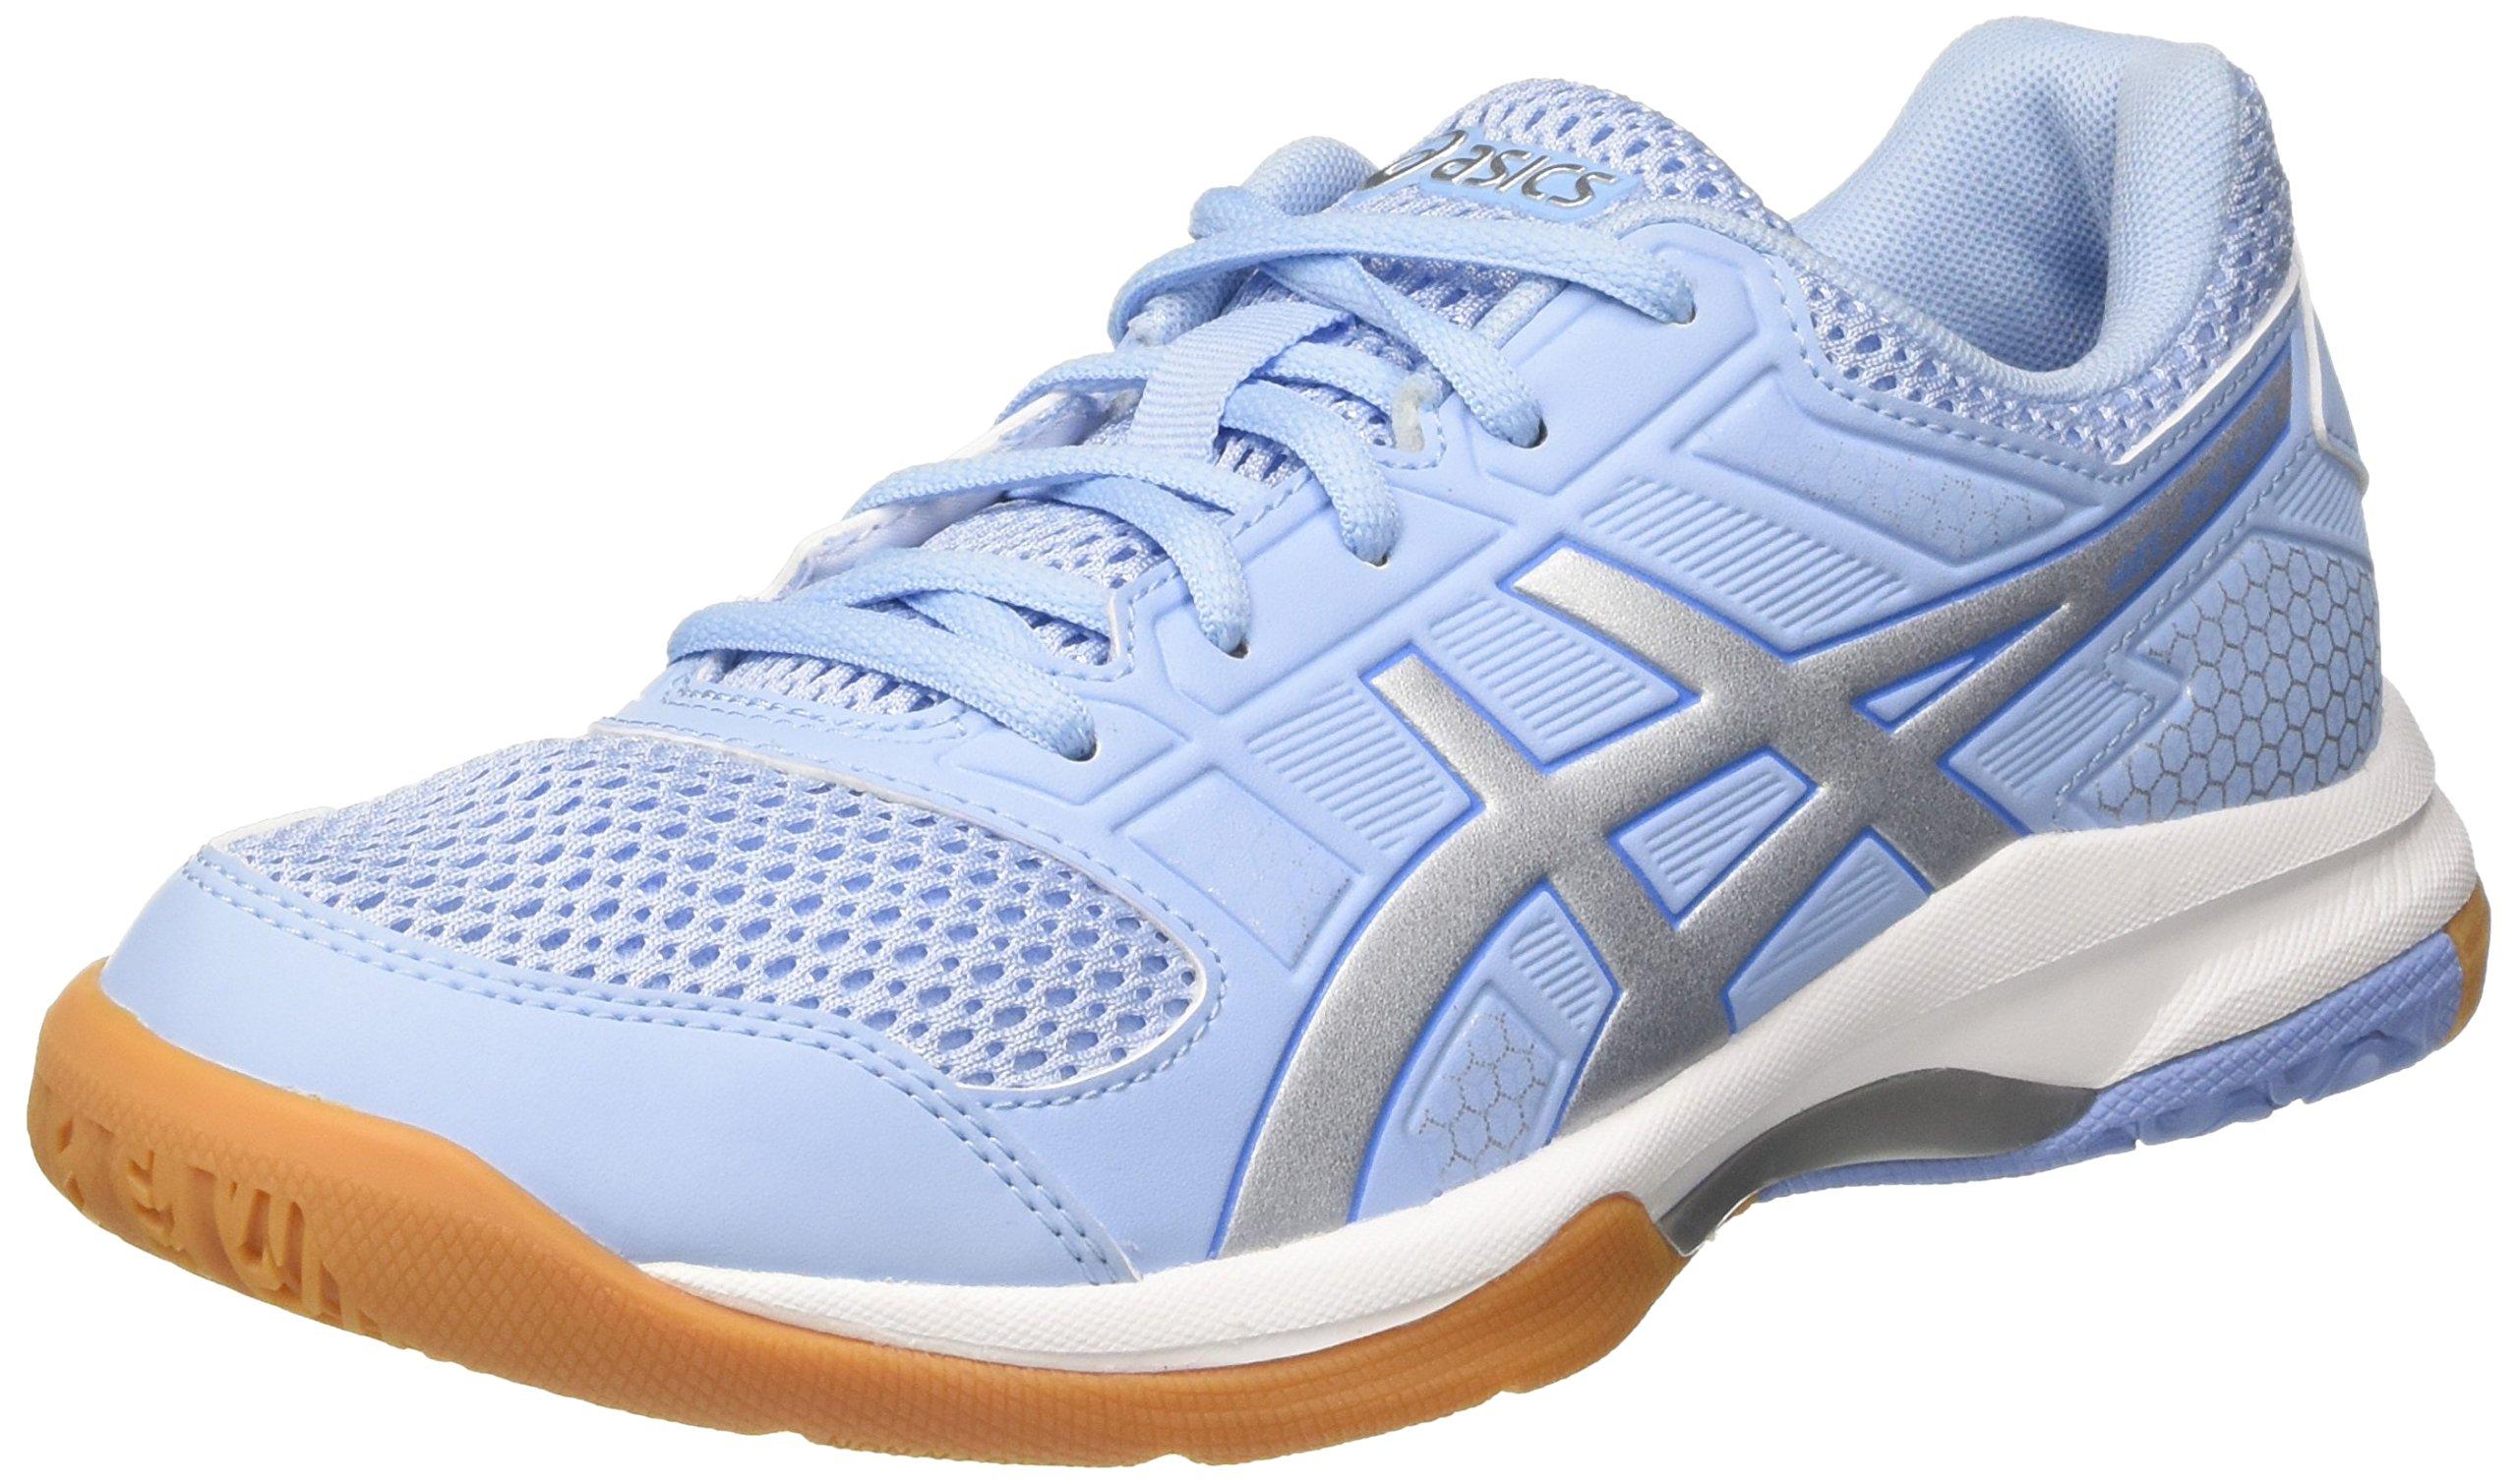 Asics Gel-Rocket 8, Zapatos de Voleibol para Mujer. Por Asics